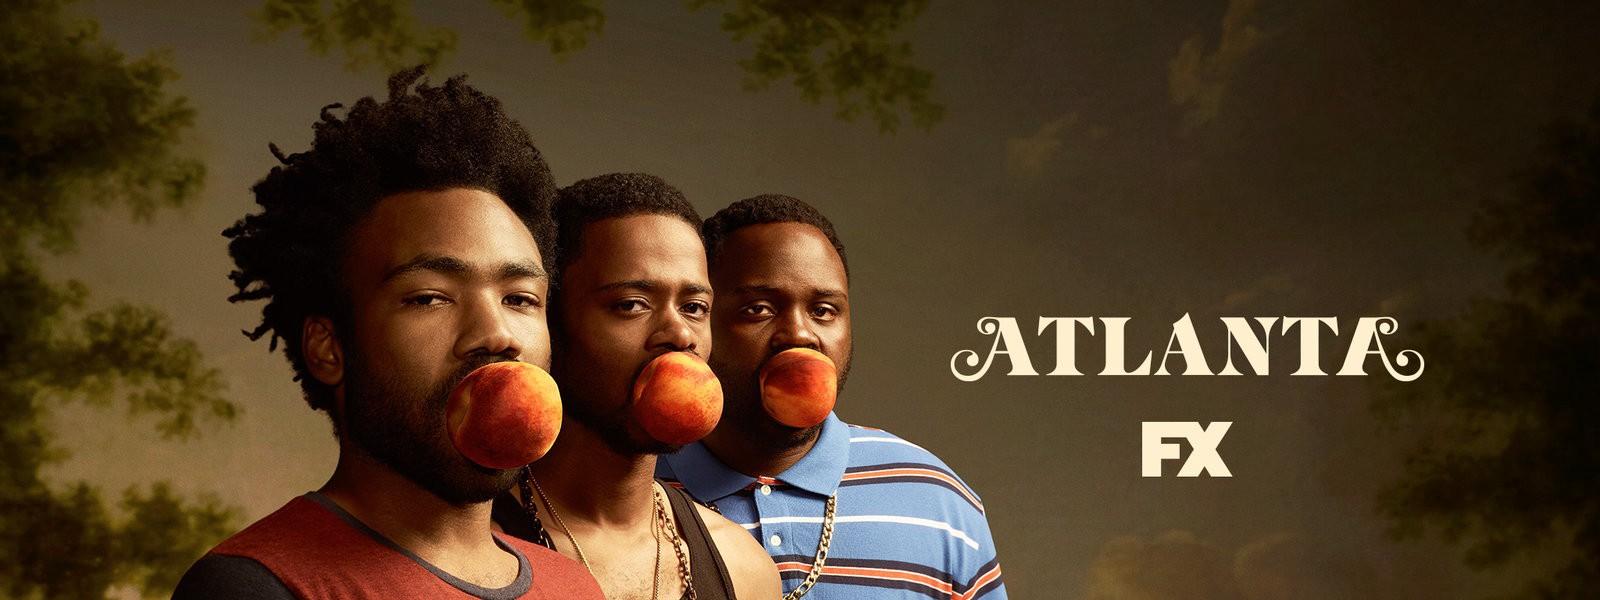 Atlanta Serie Netflix